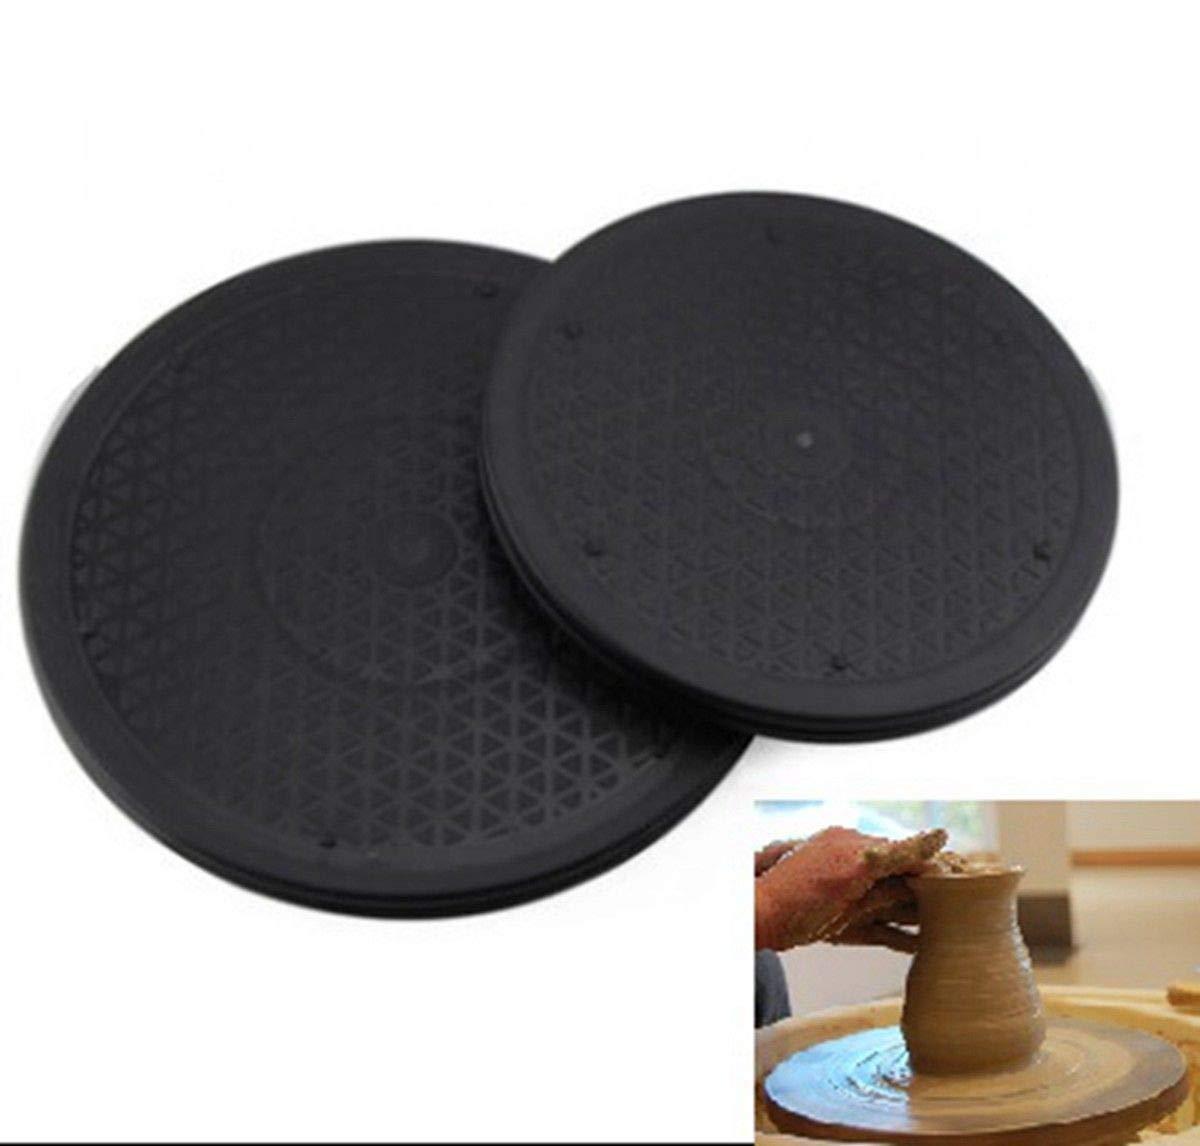 FidgetFidget Pottery Plate Turntable Clay Wheel Plate Turning 25cm(9.8in)